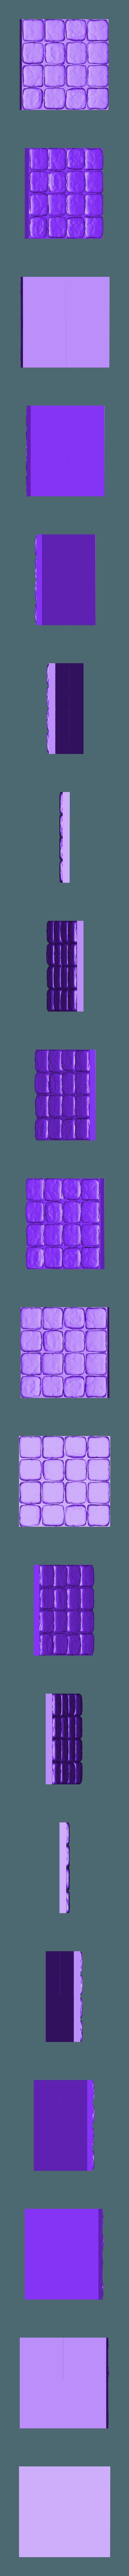 OpenForge_4x4_floor_only.obj Download free OBJ file Dungeons Tile Set • 3D printing object, 3DRune